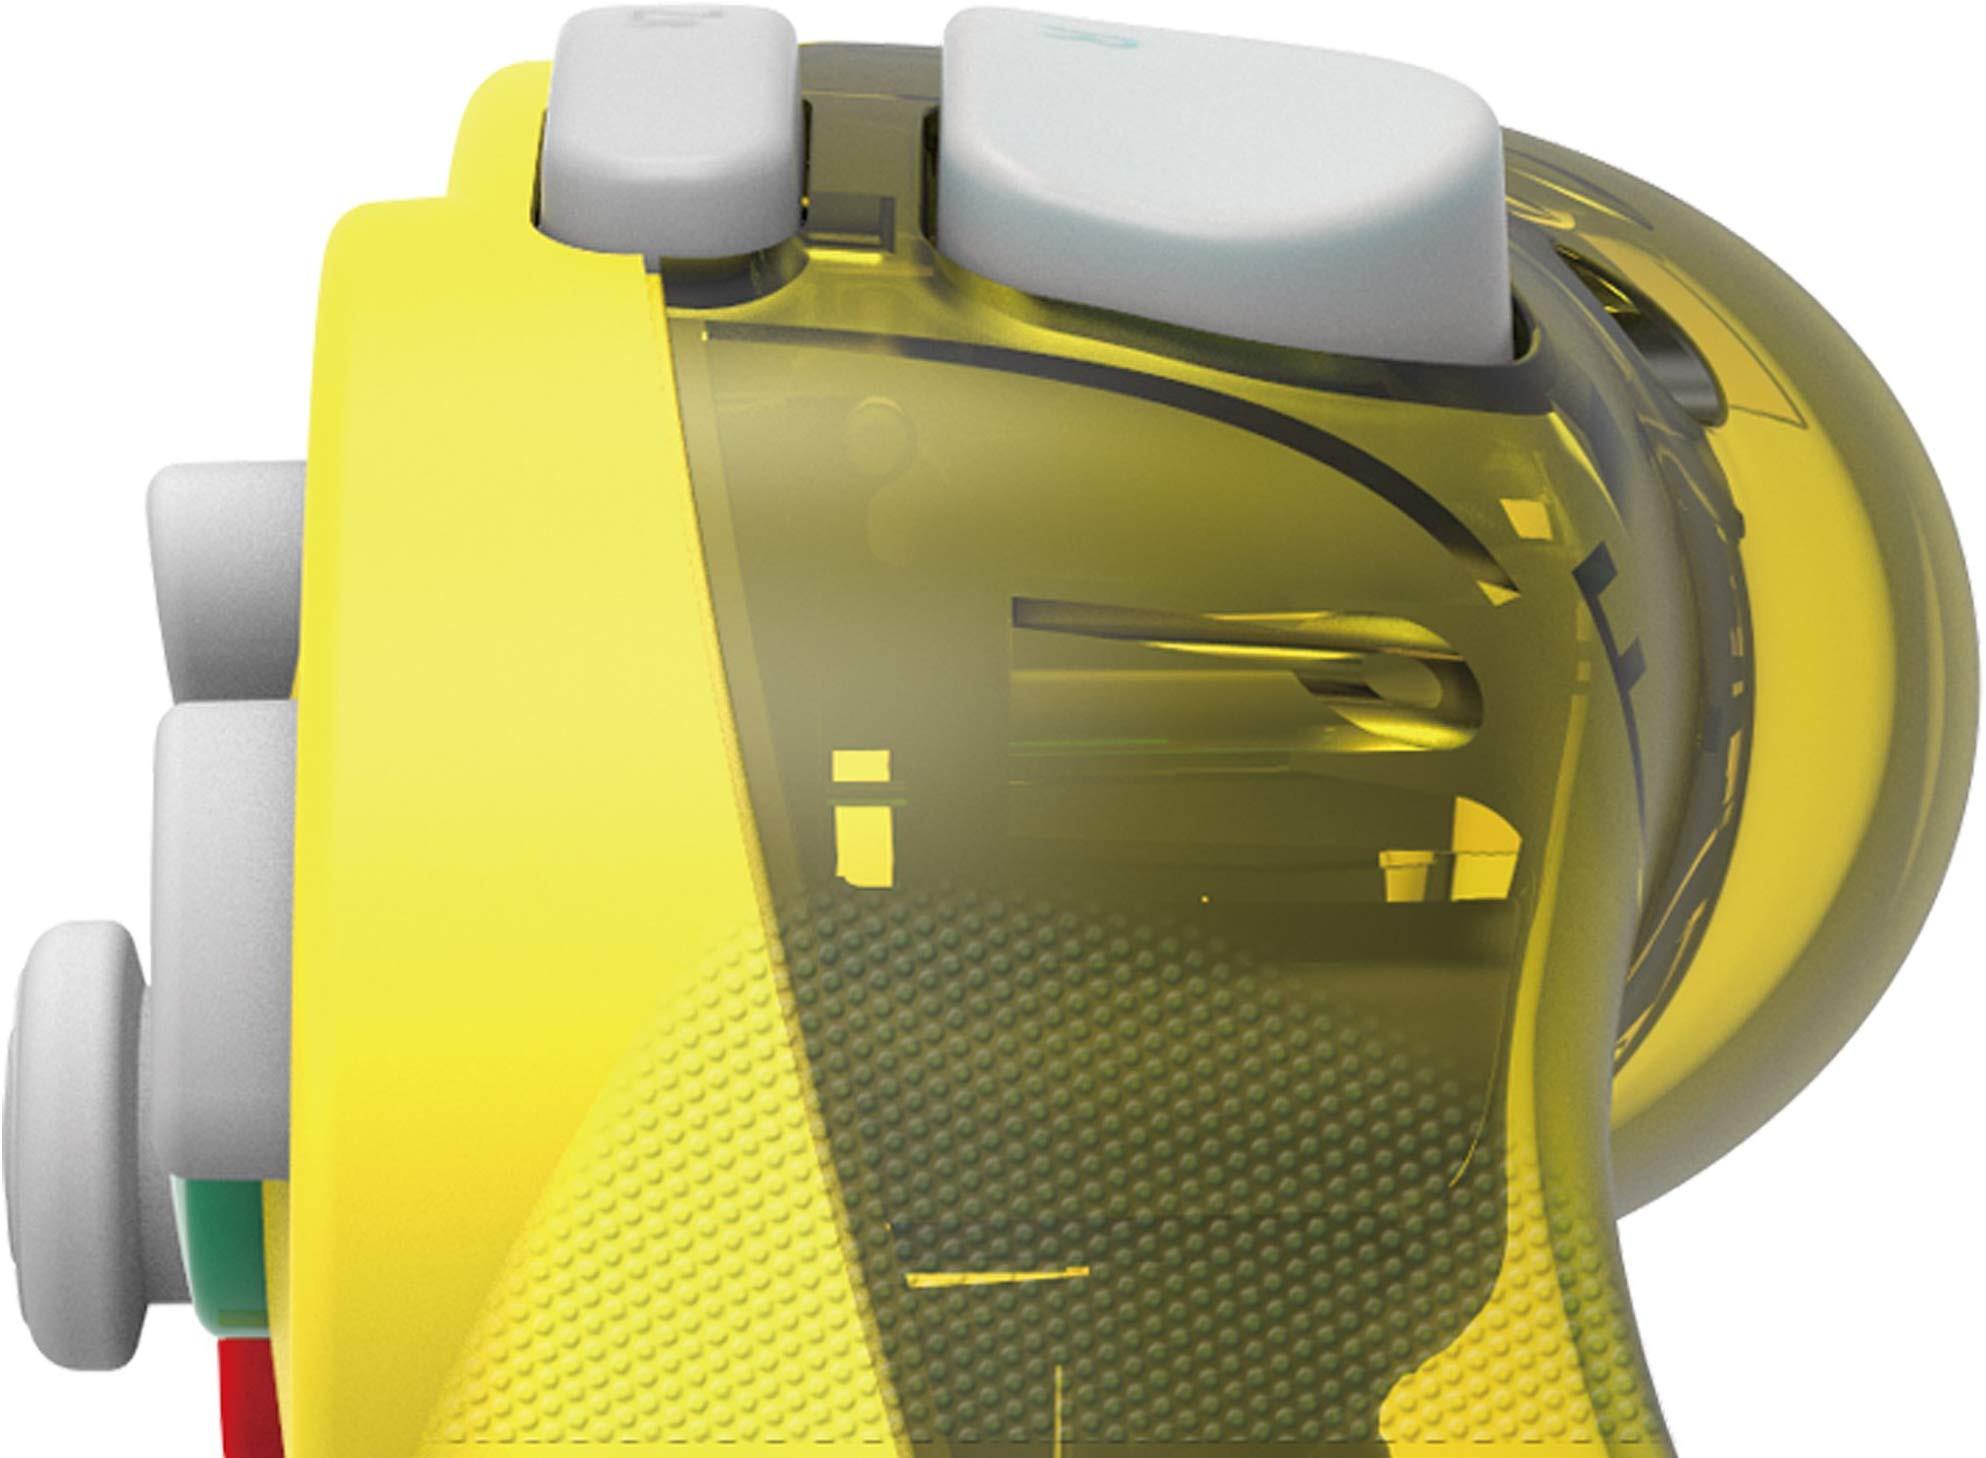 HORI Nintendo Switch Battle Pad (Pikachu) GameCube Style Controller